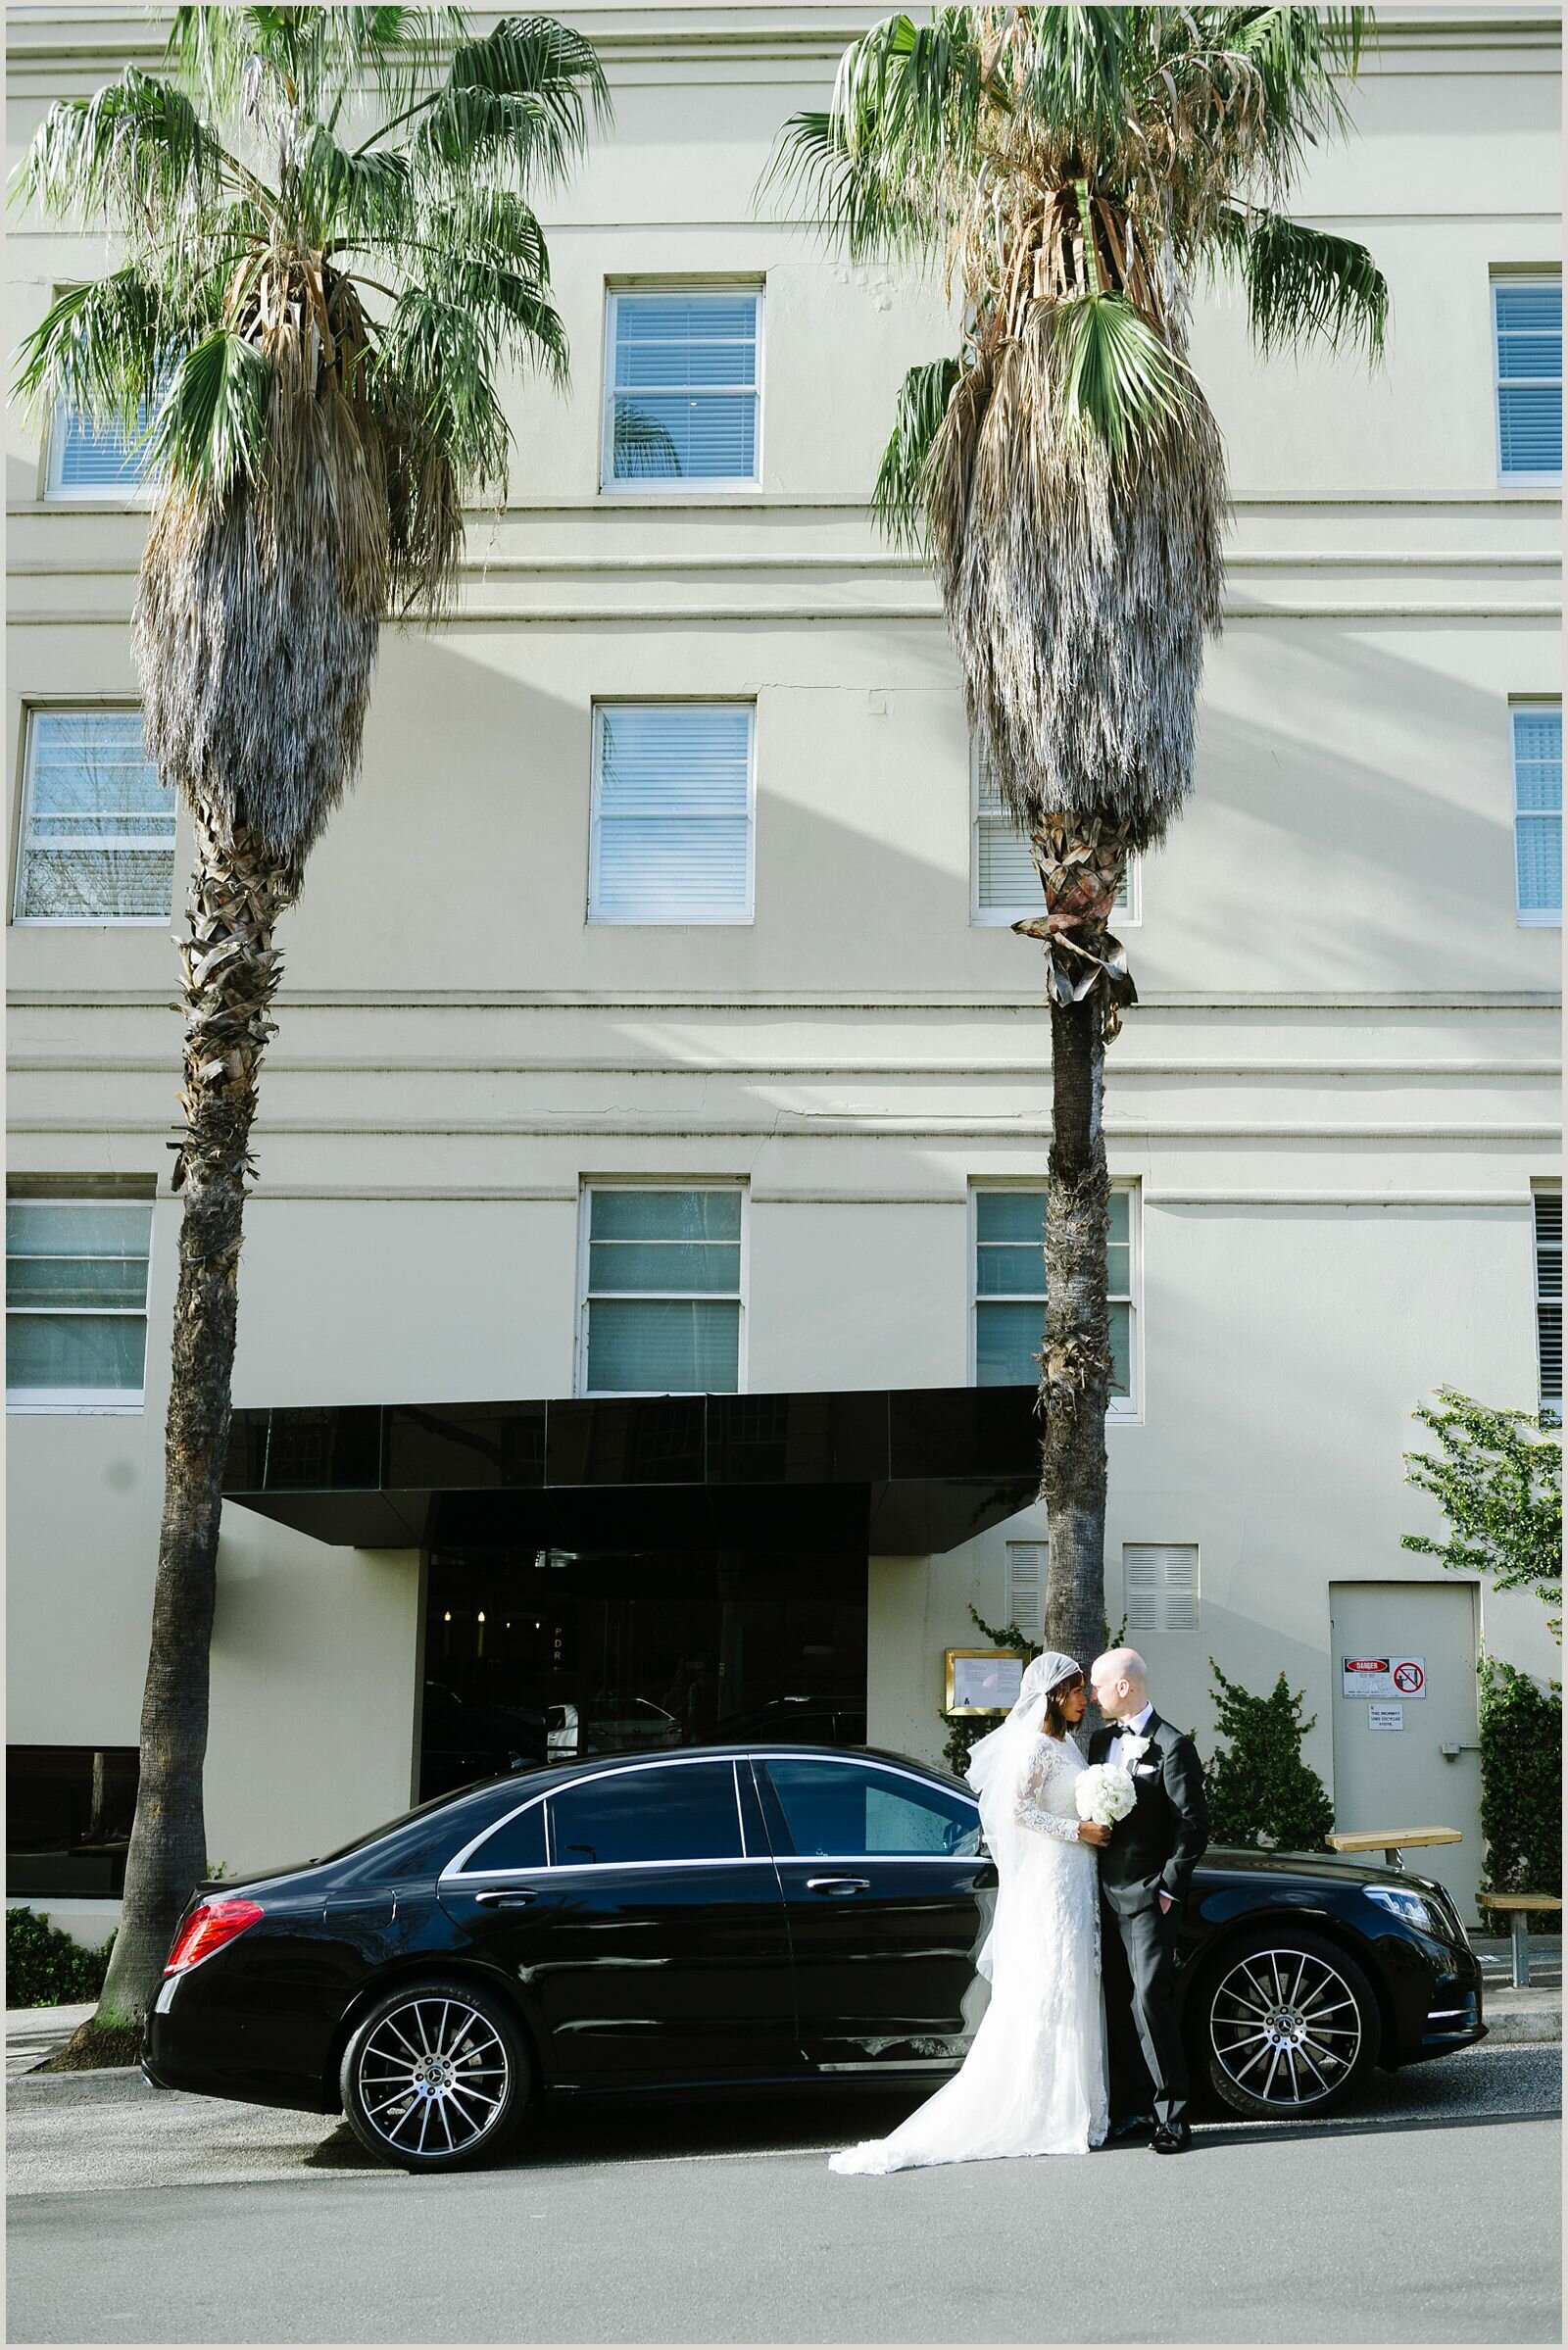 joseph_koprek_wedding_melbourne_the_prince_deck_0032.jpg